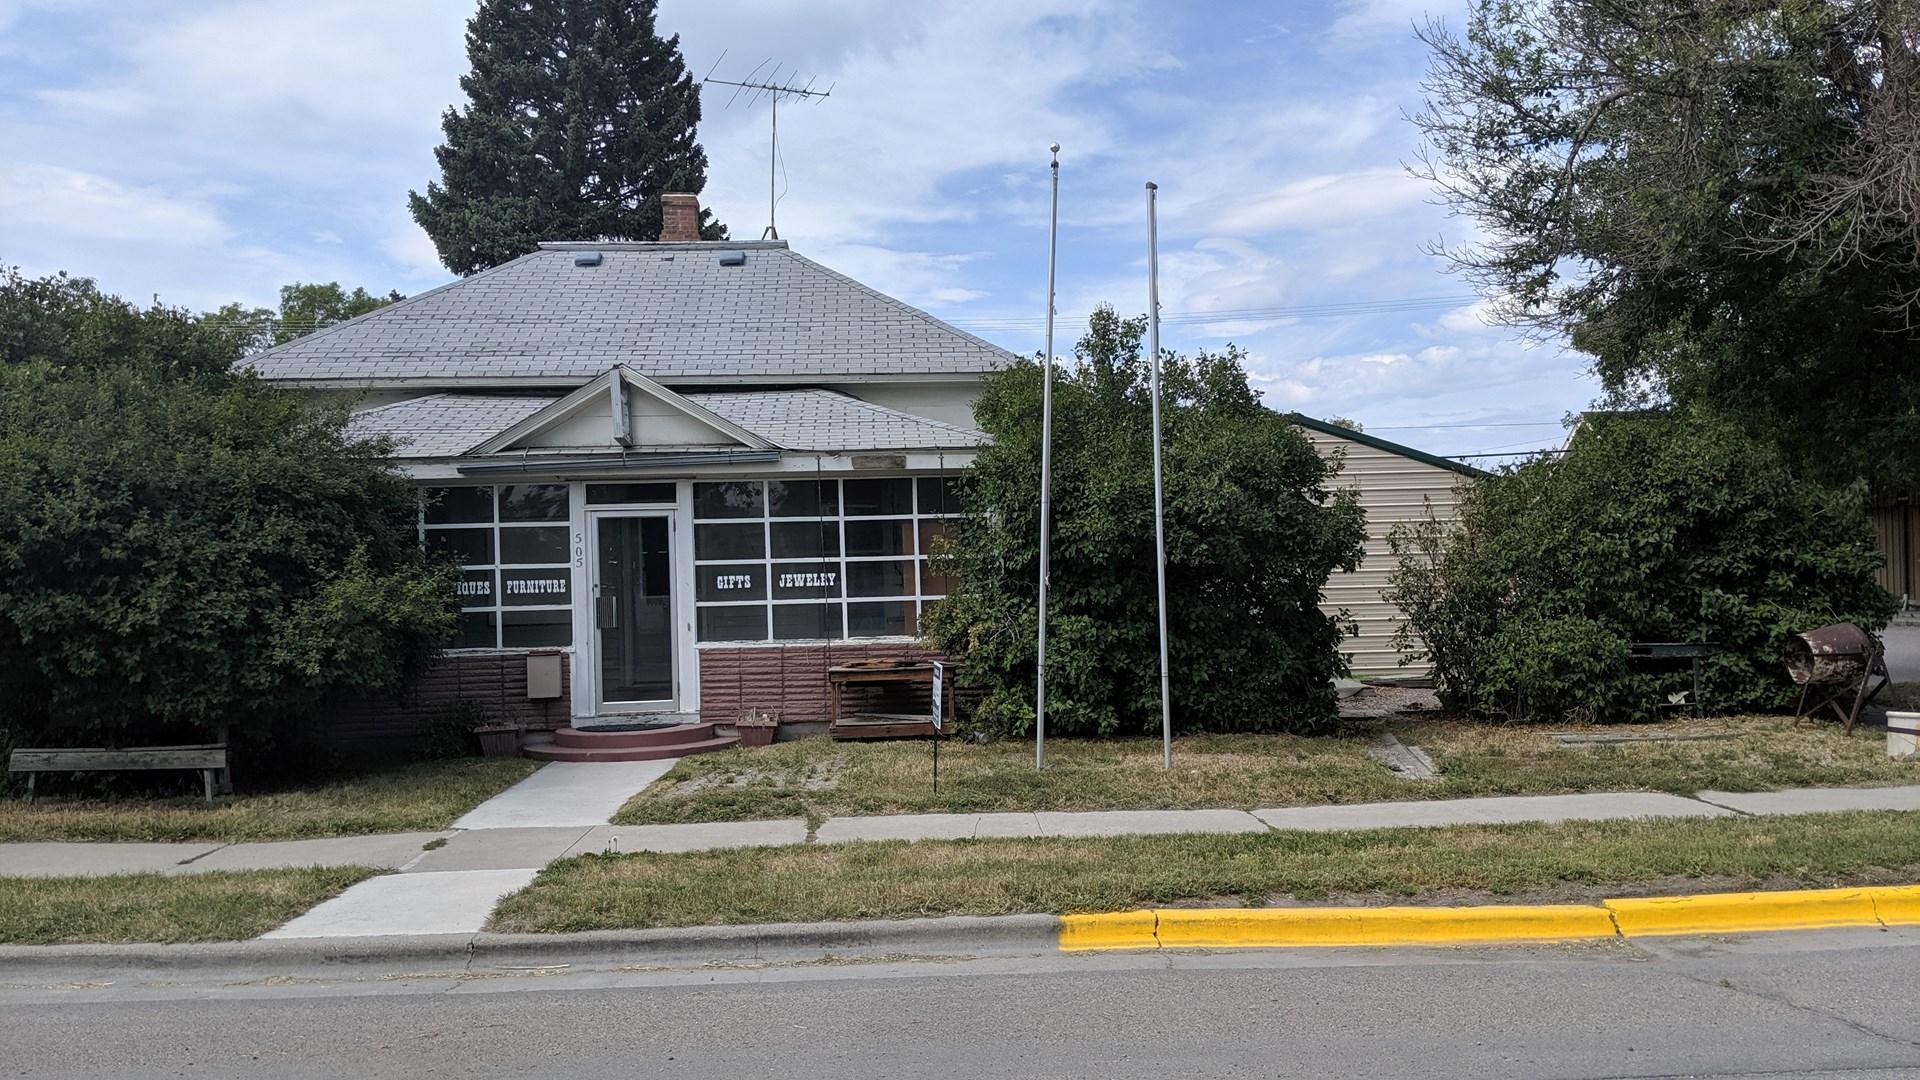 House close to UMWMC in Dillon, Montana